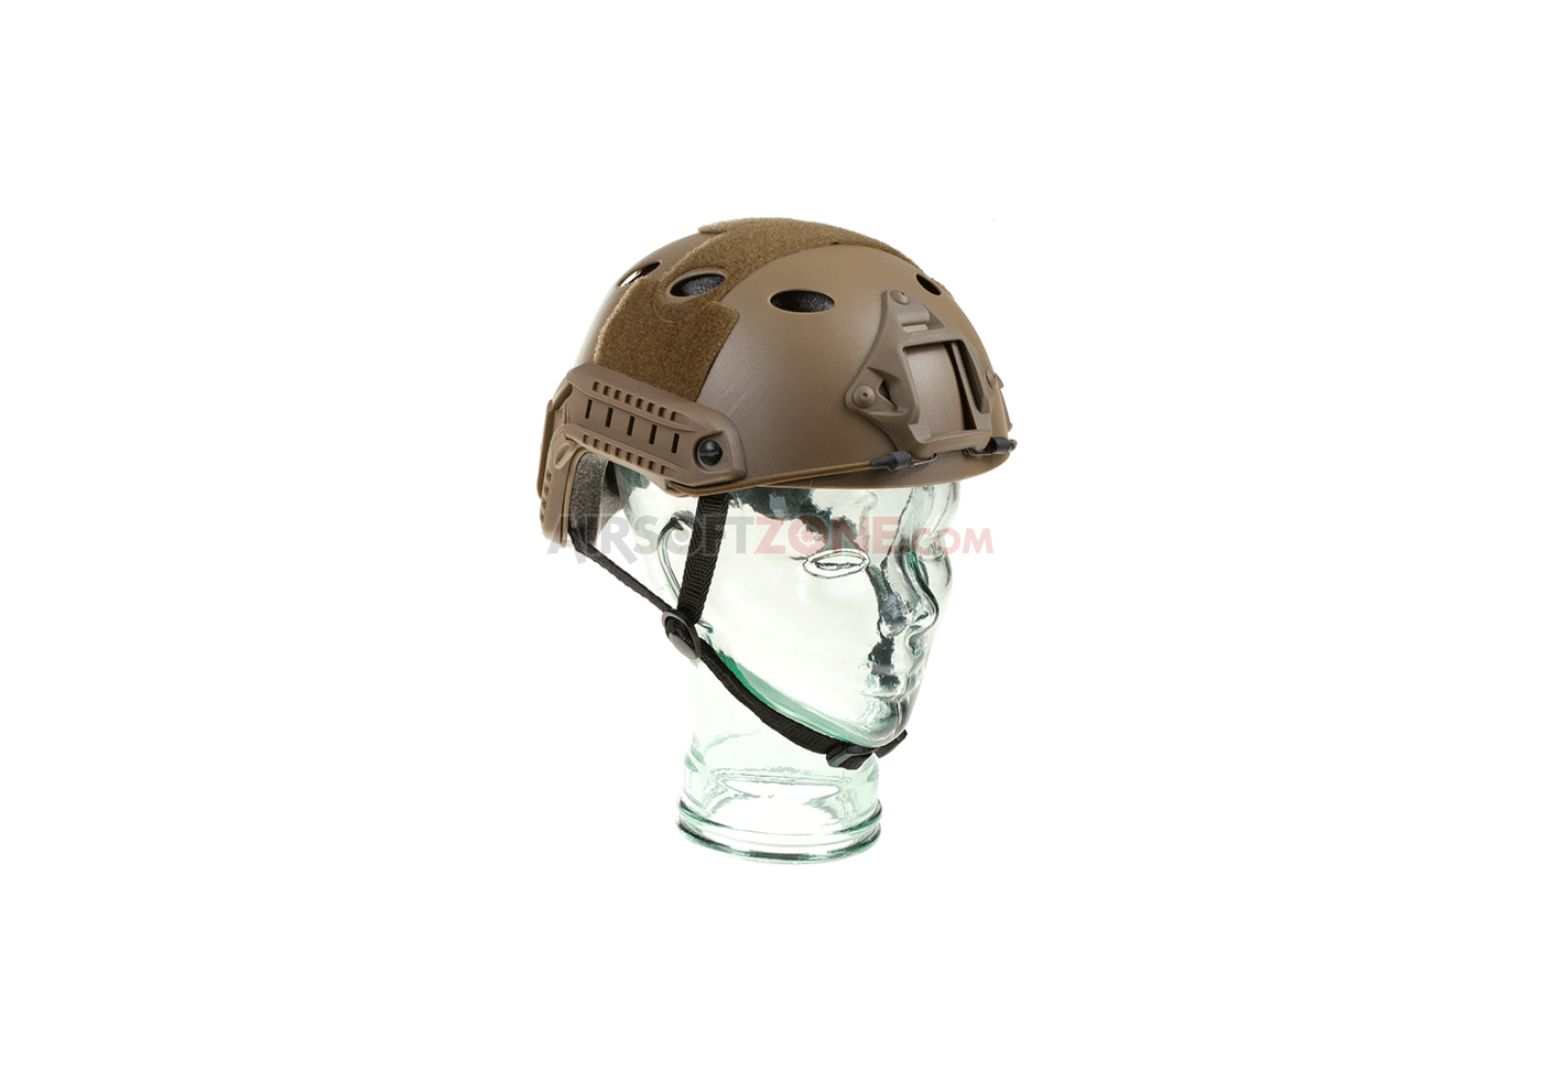 Fast Pj Helmet Eco (Tan)